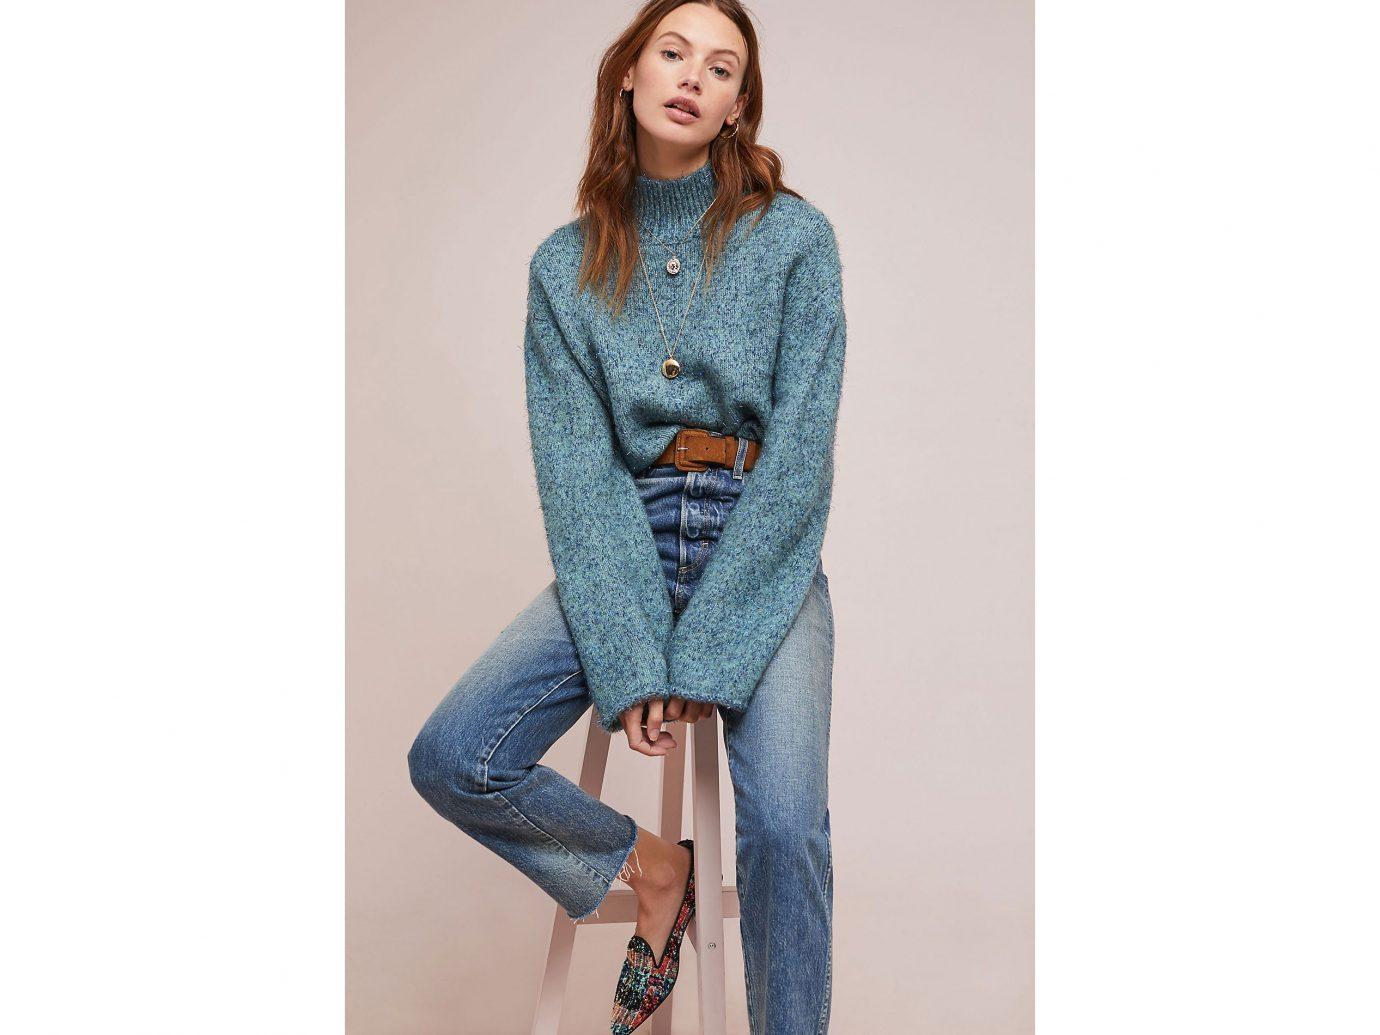 Anthropologie Sparkle Knit Turtleneck Sweater